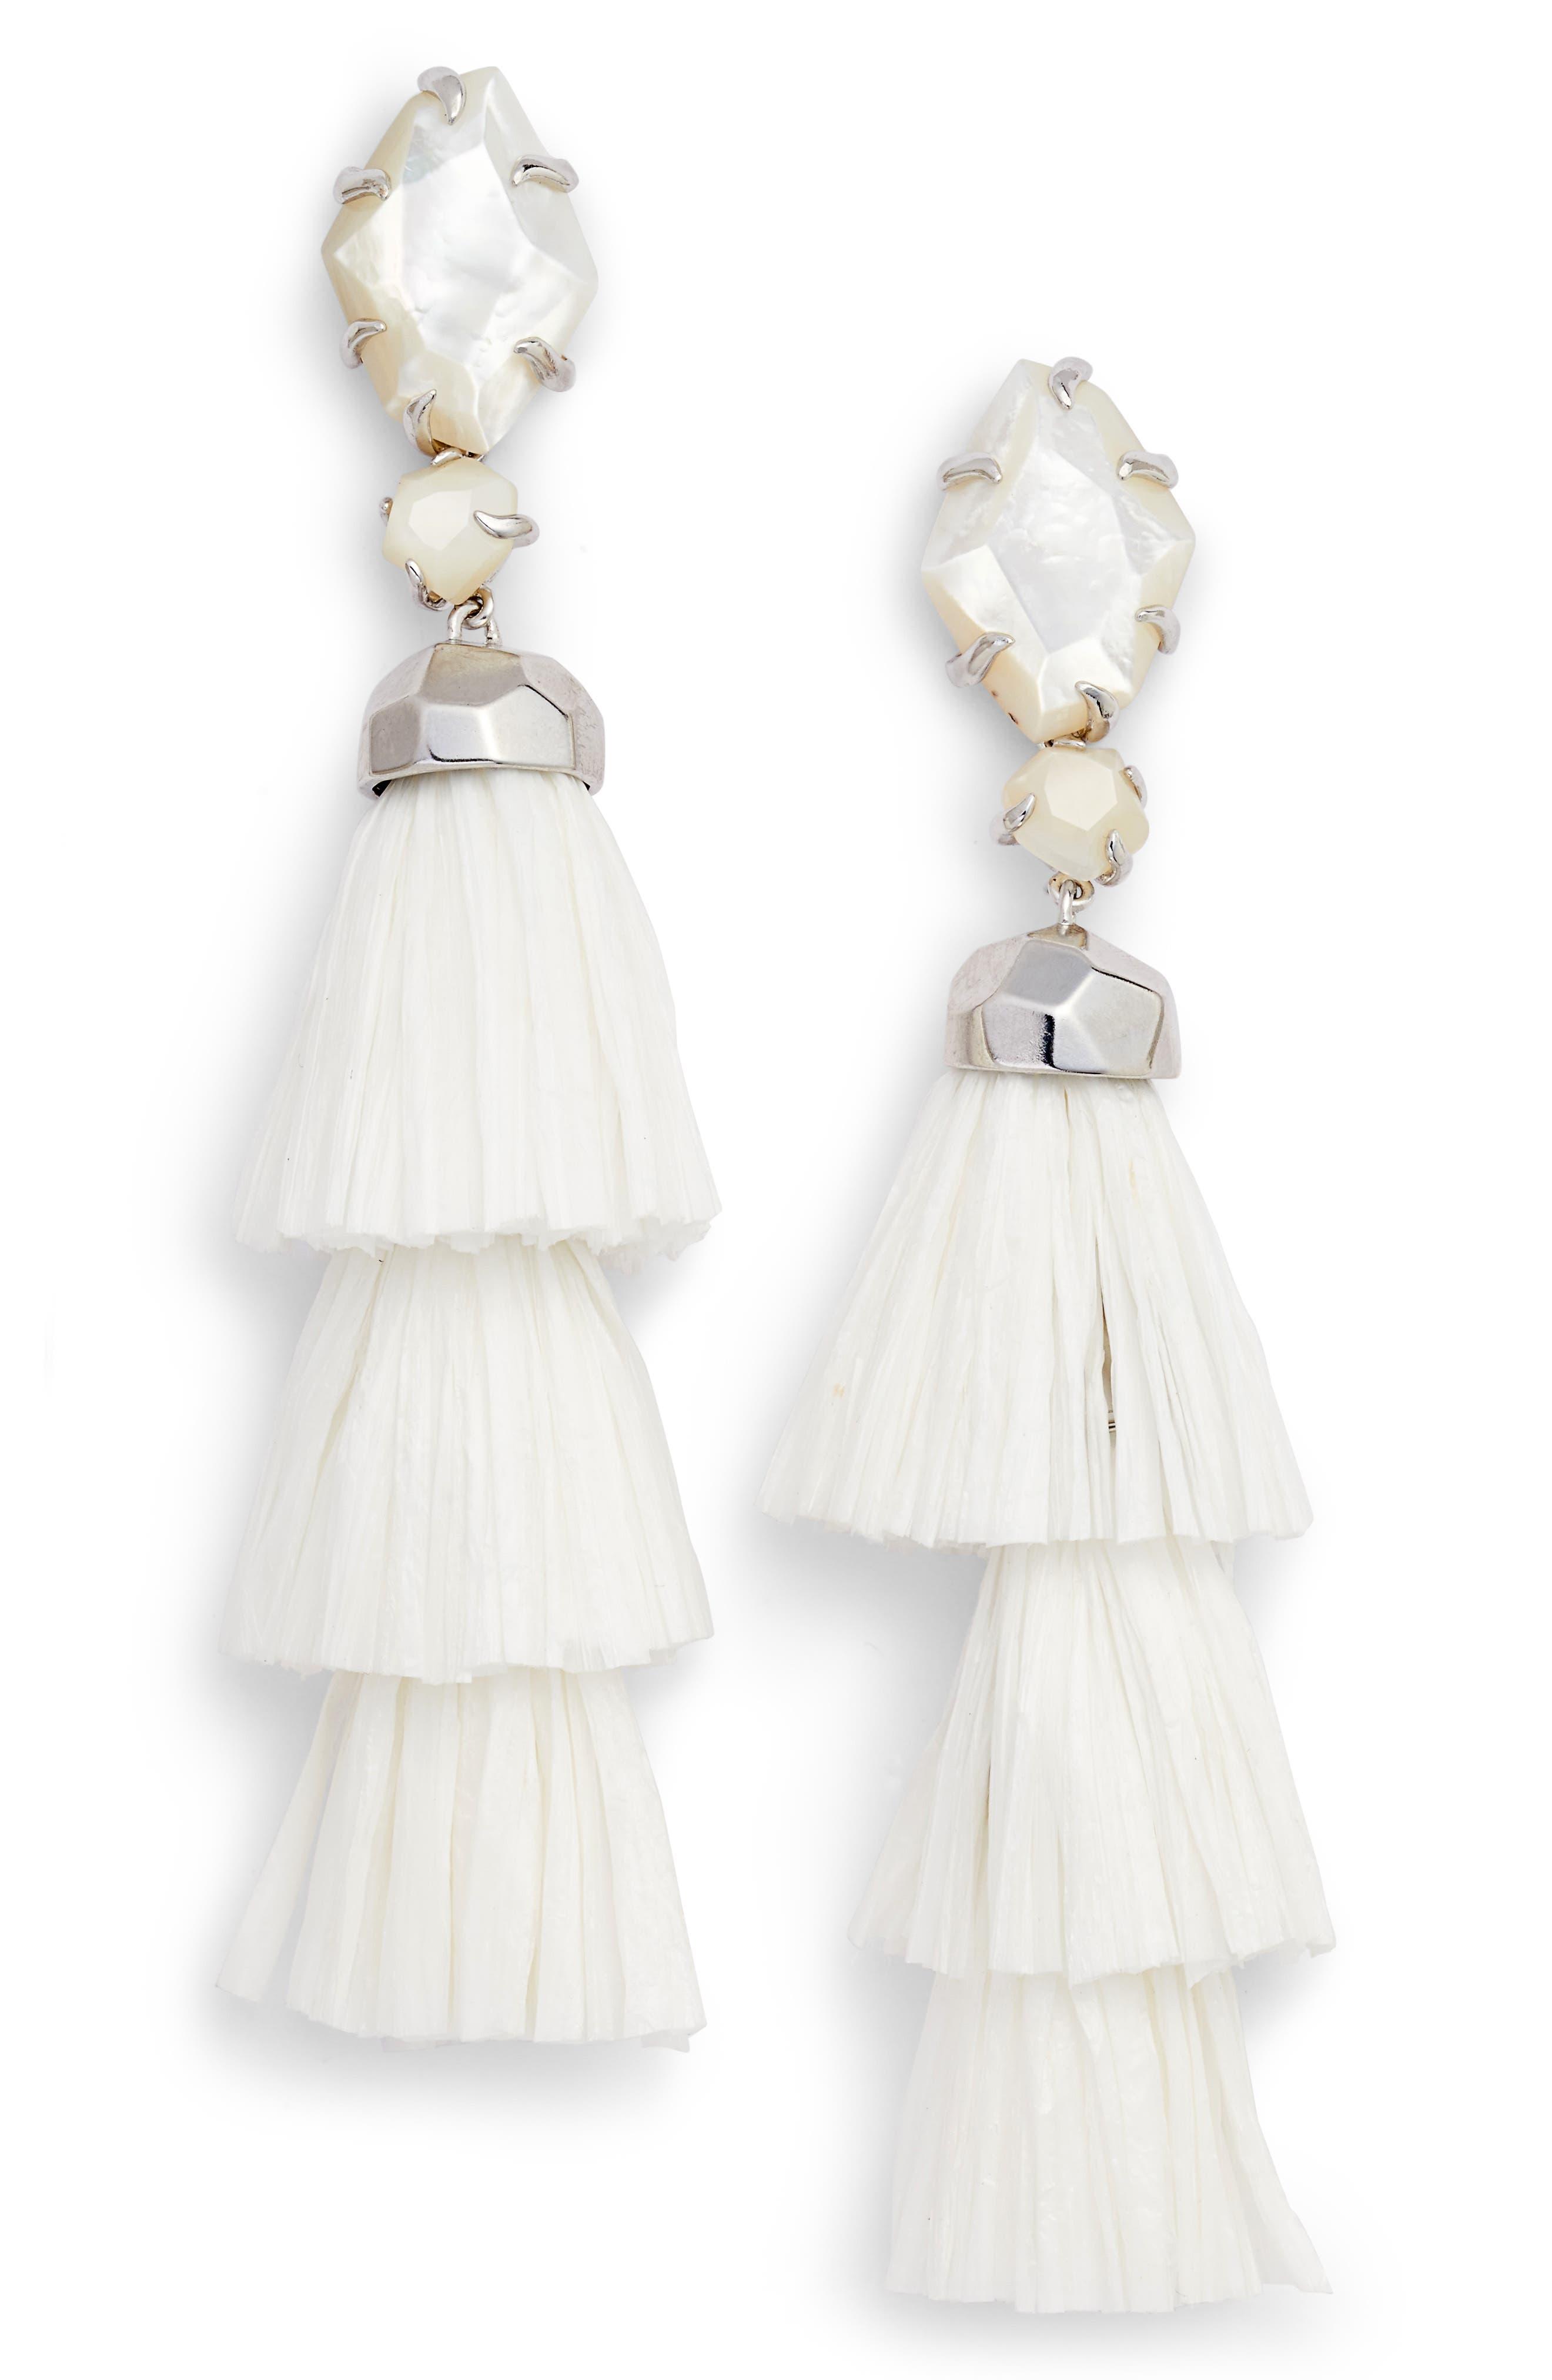 KENDRA SCOTT Denise 3-in-1 Tassel Earrings, Main, color, 100